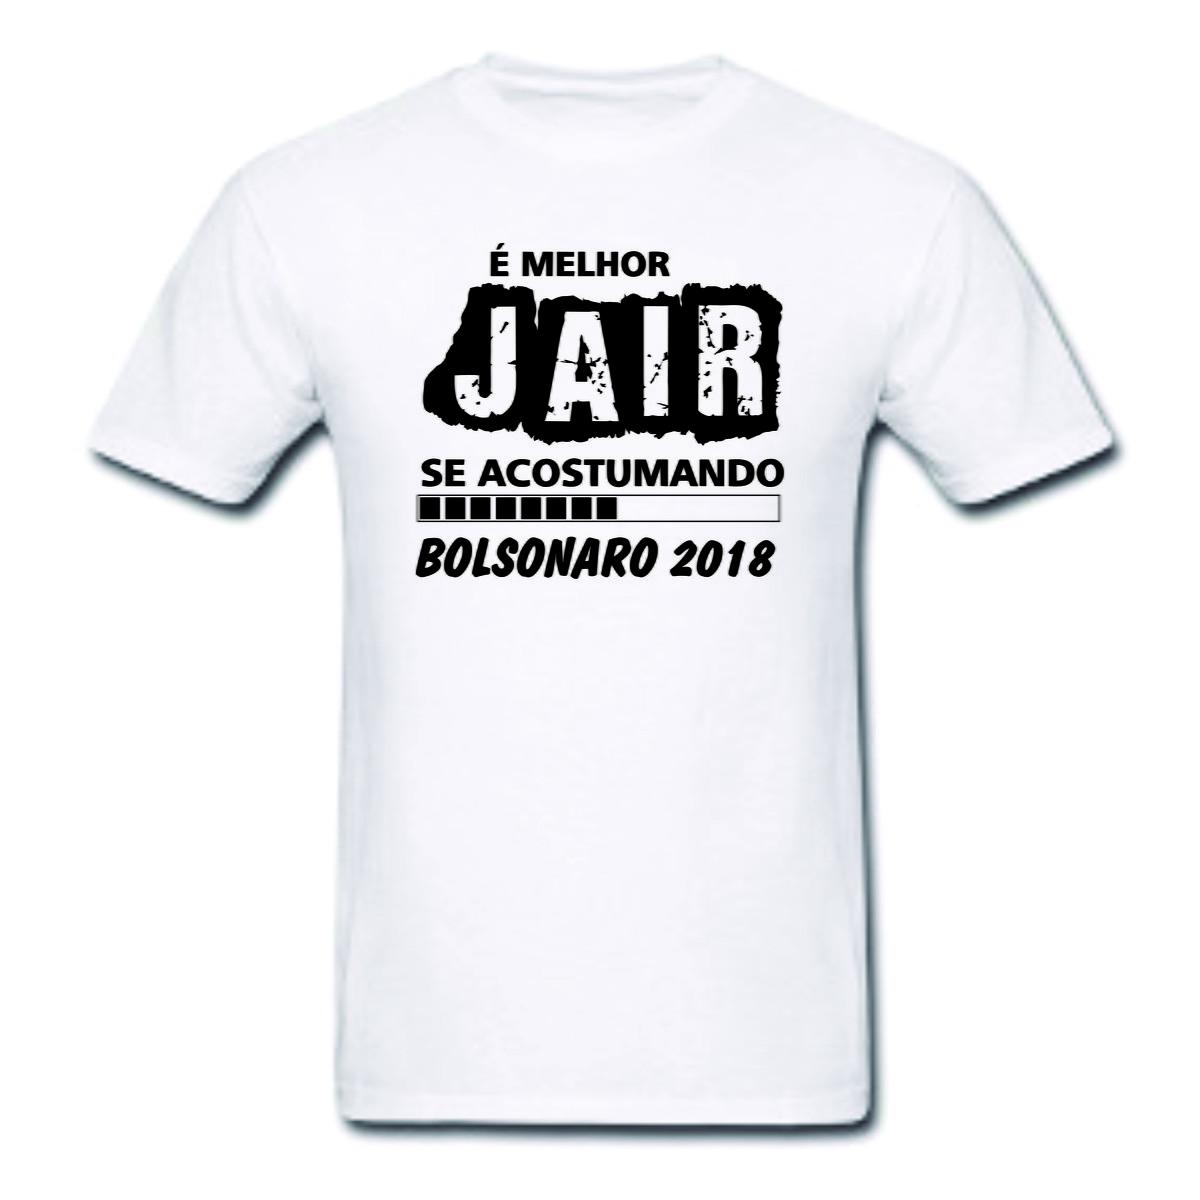 b0c9131f4f6ee2 Camiseta Bolsonaro no Elo7   Loja Das Camisetas (AC0FC5)